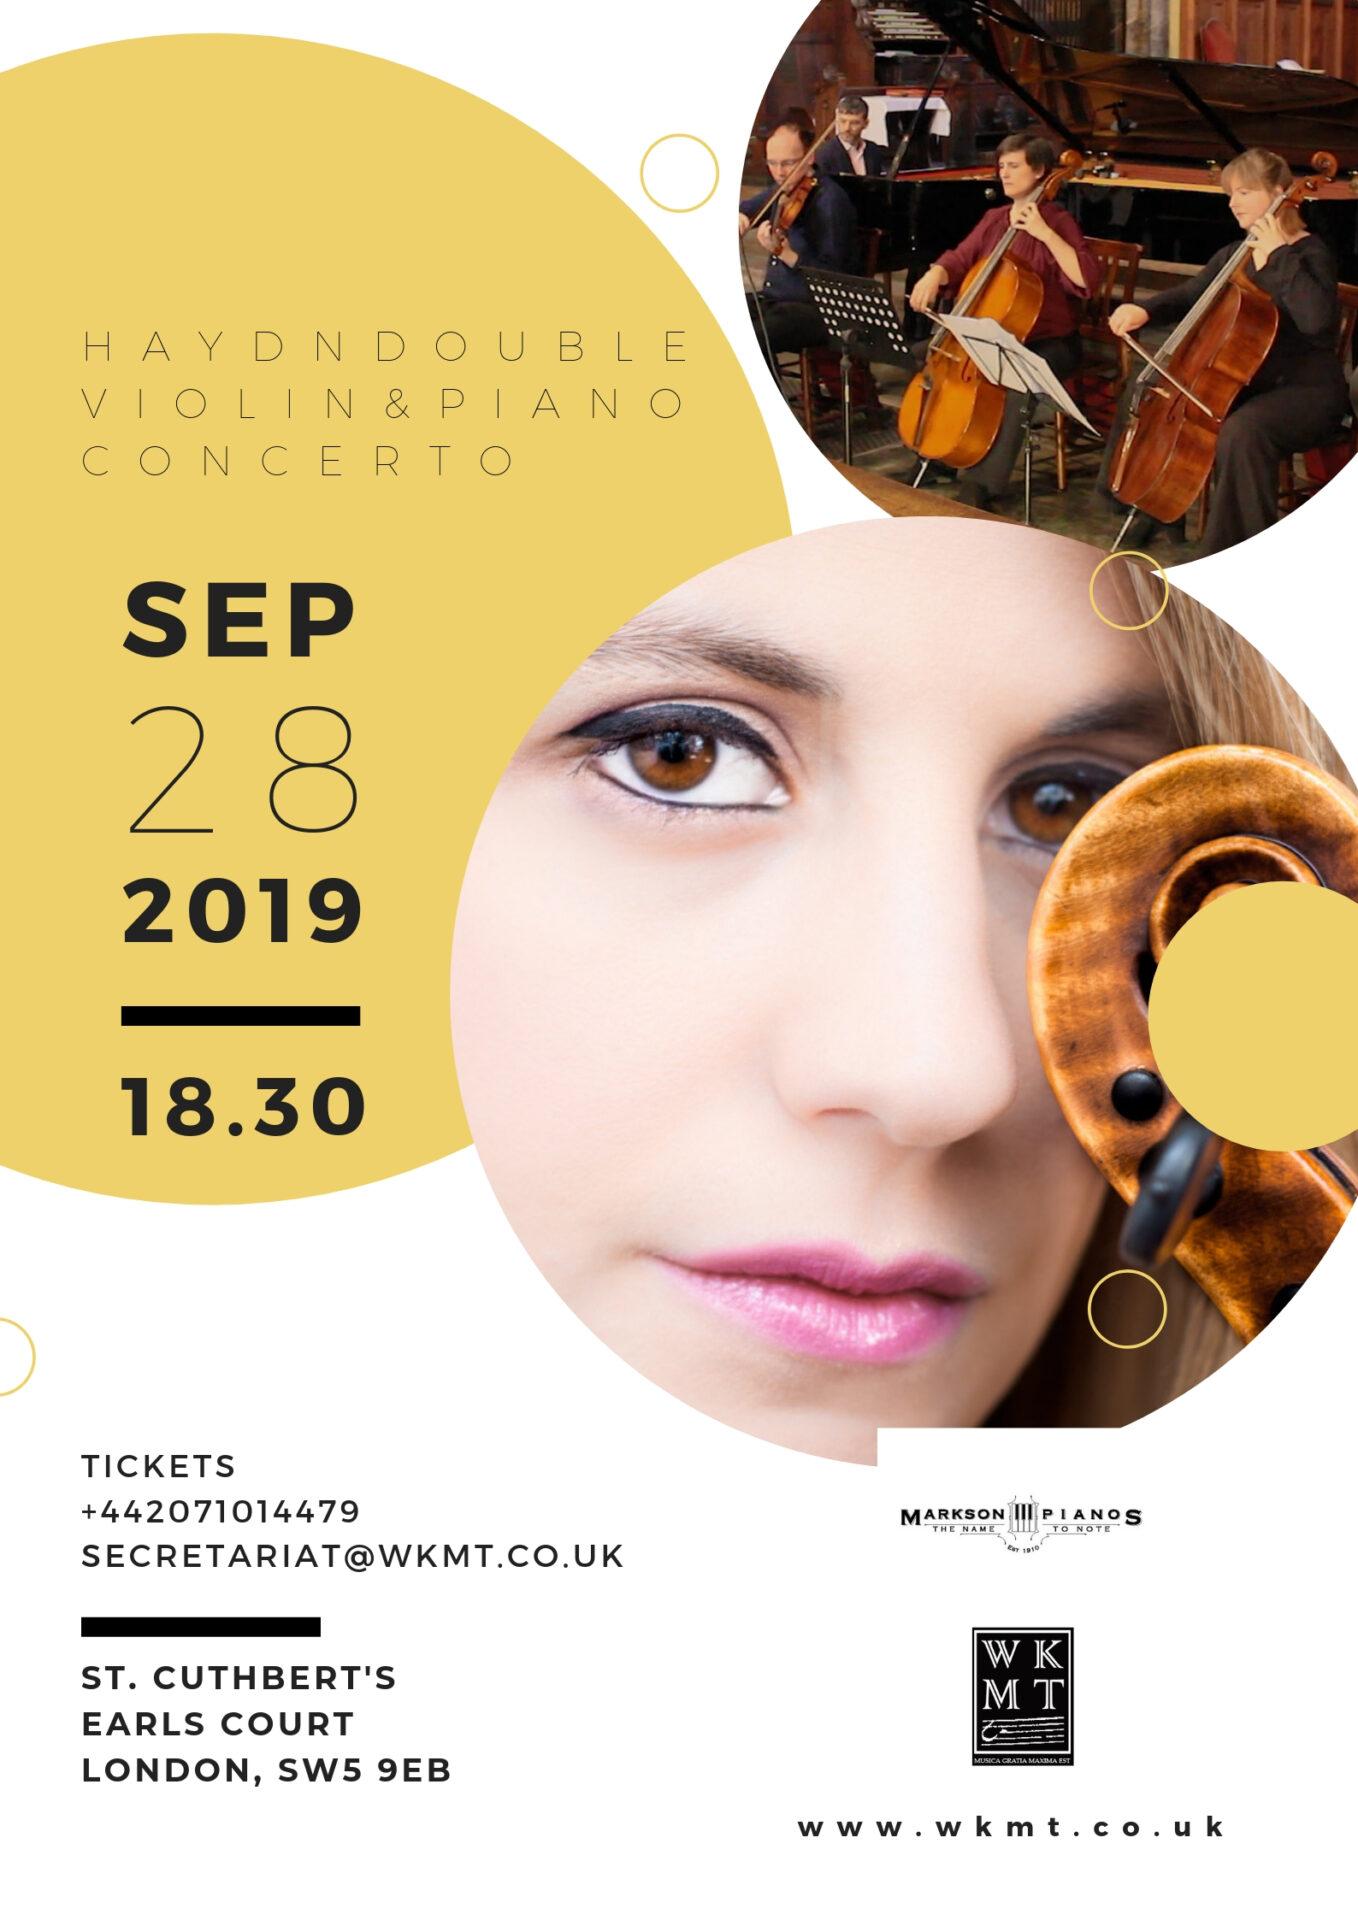 Our next WKMT Concert in September